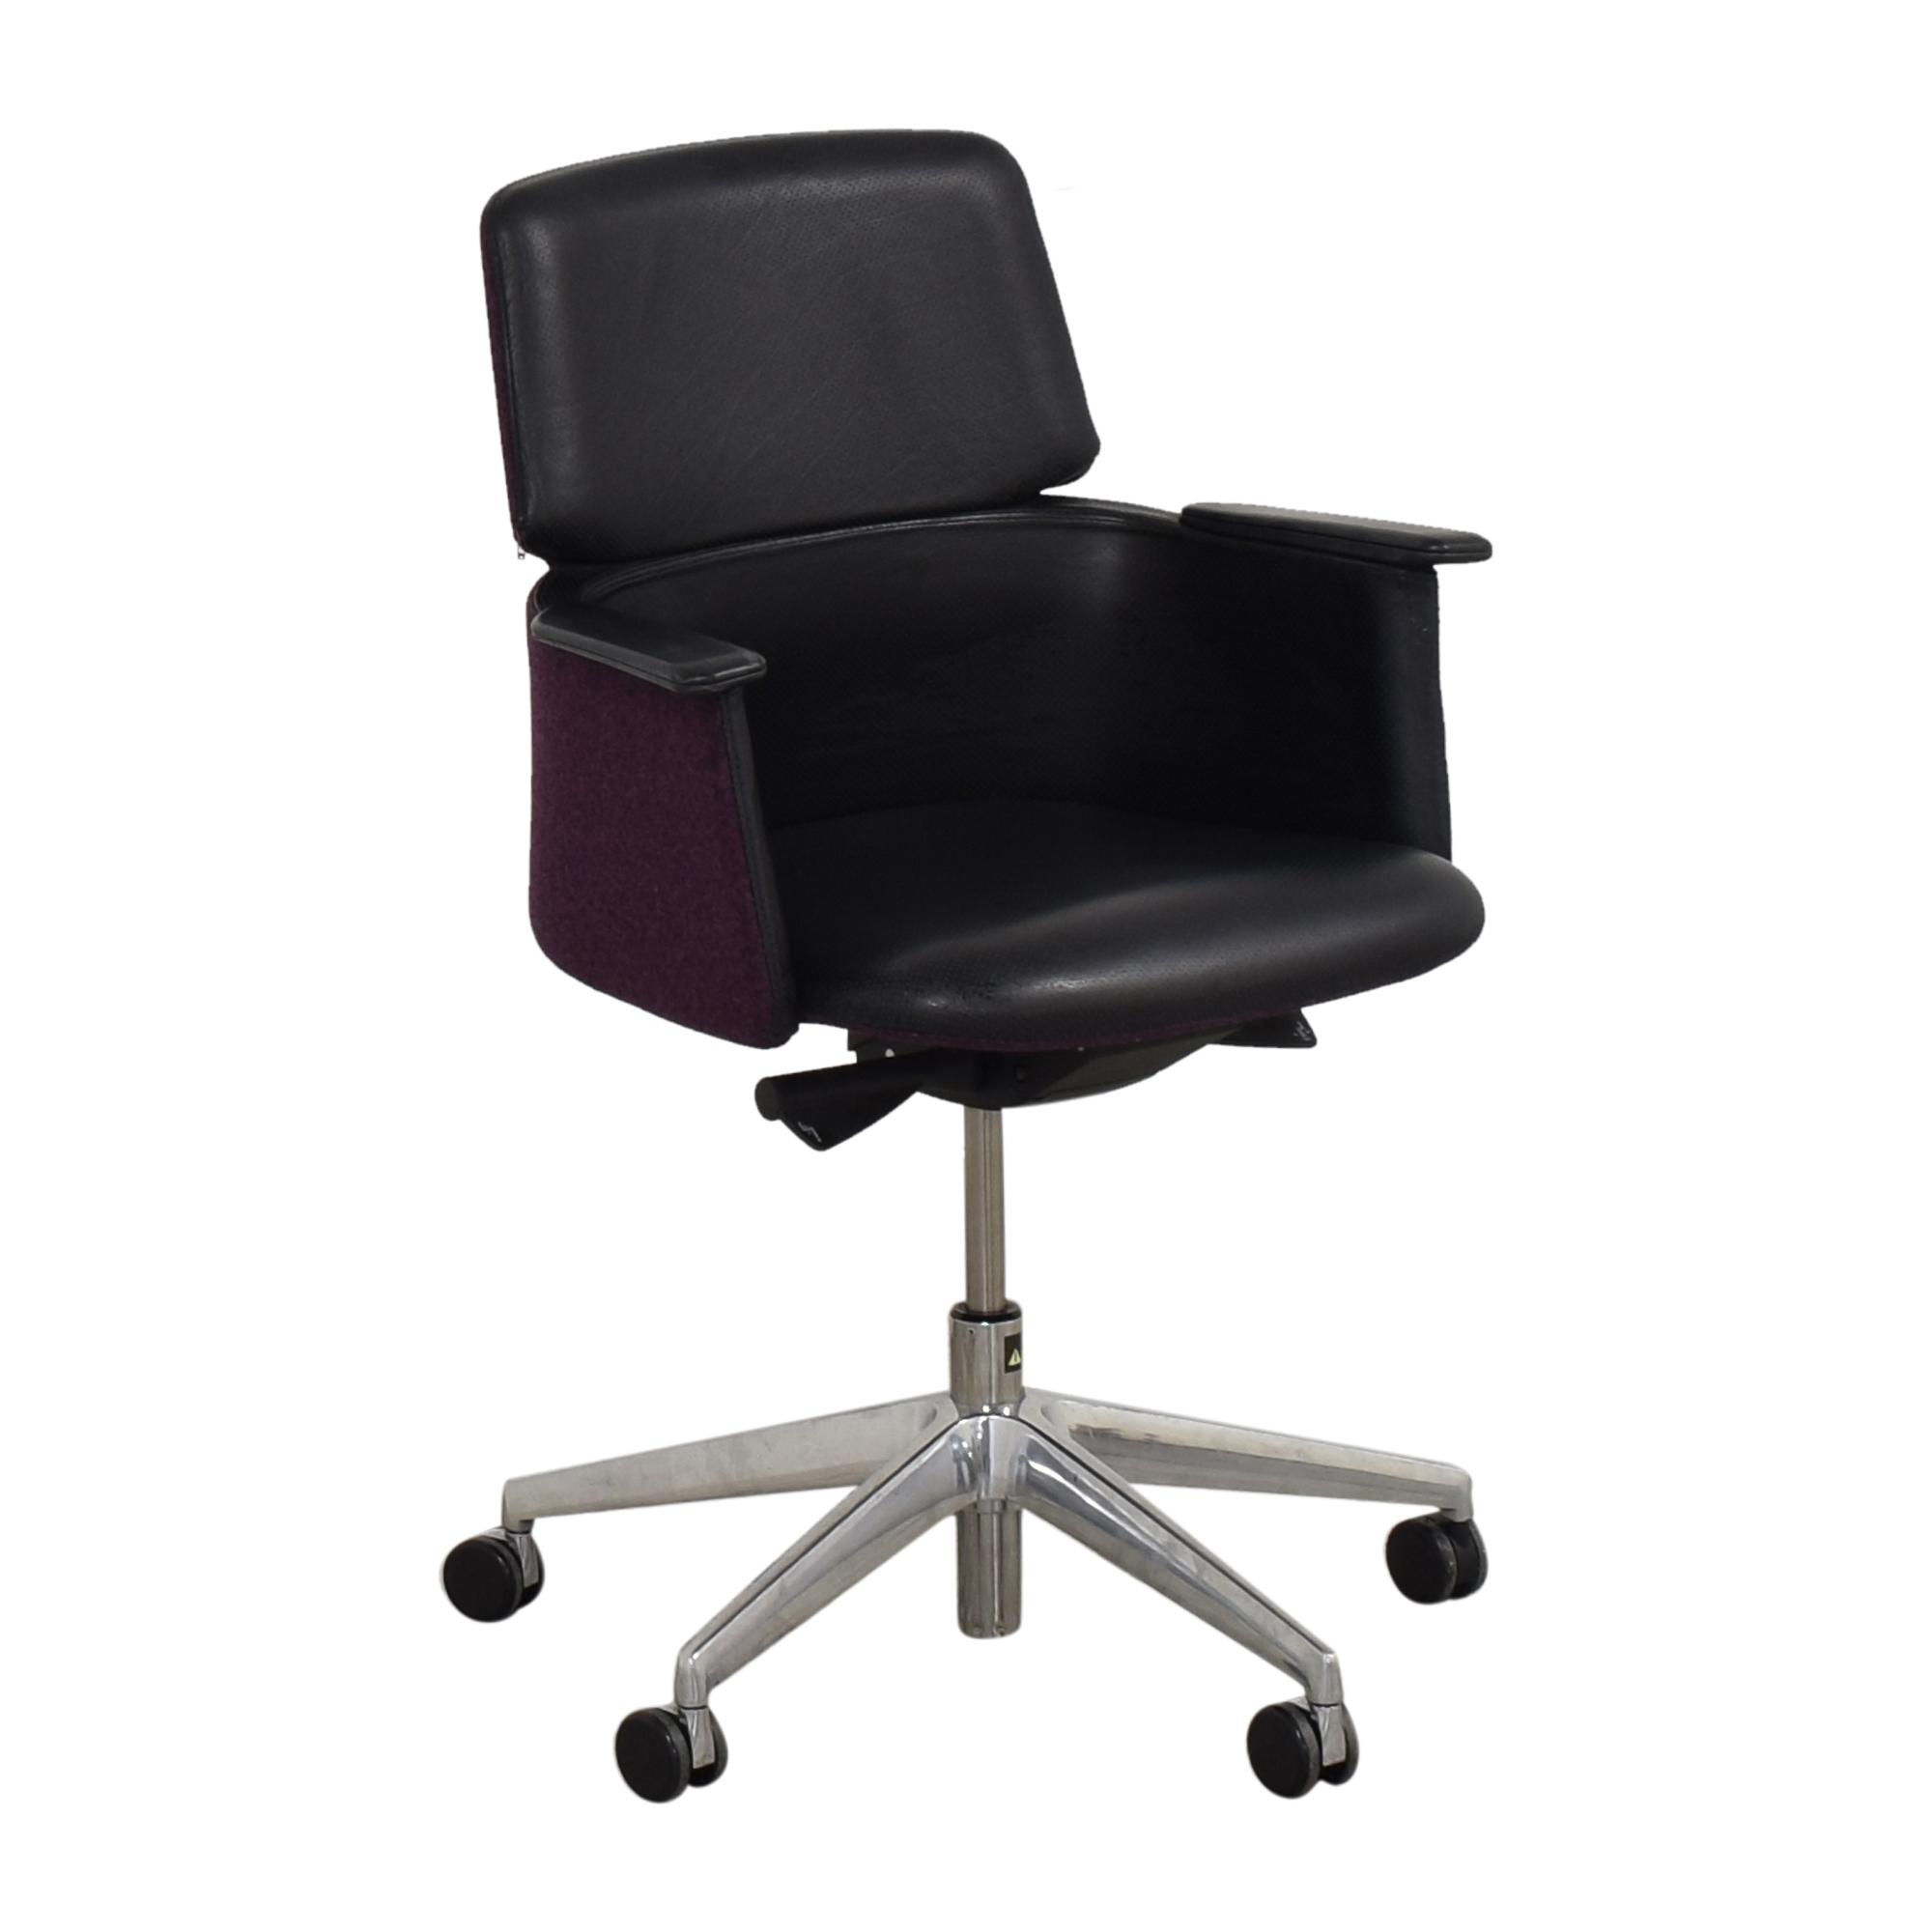 Koleksiyon Tola Task Chair / Home Office Chairs